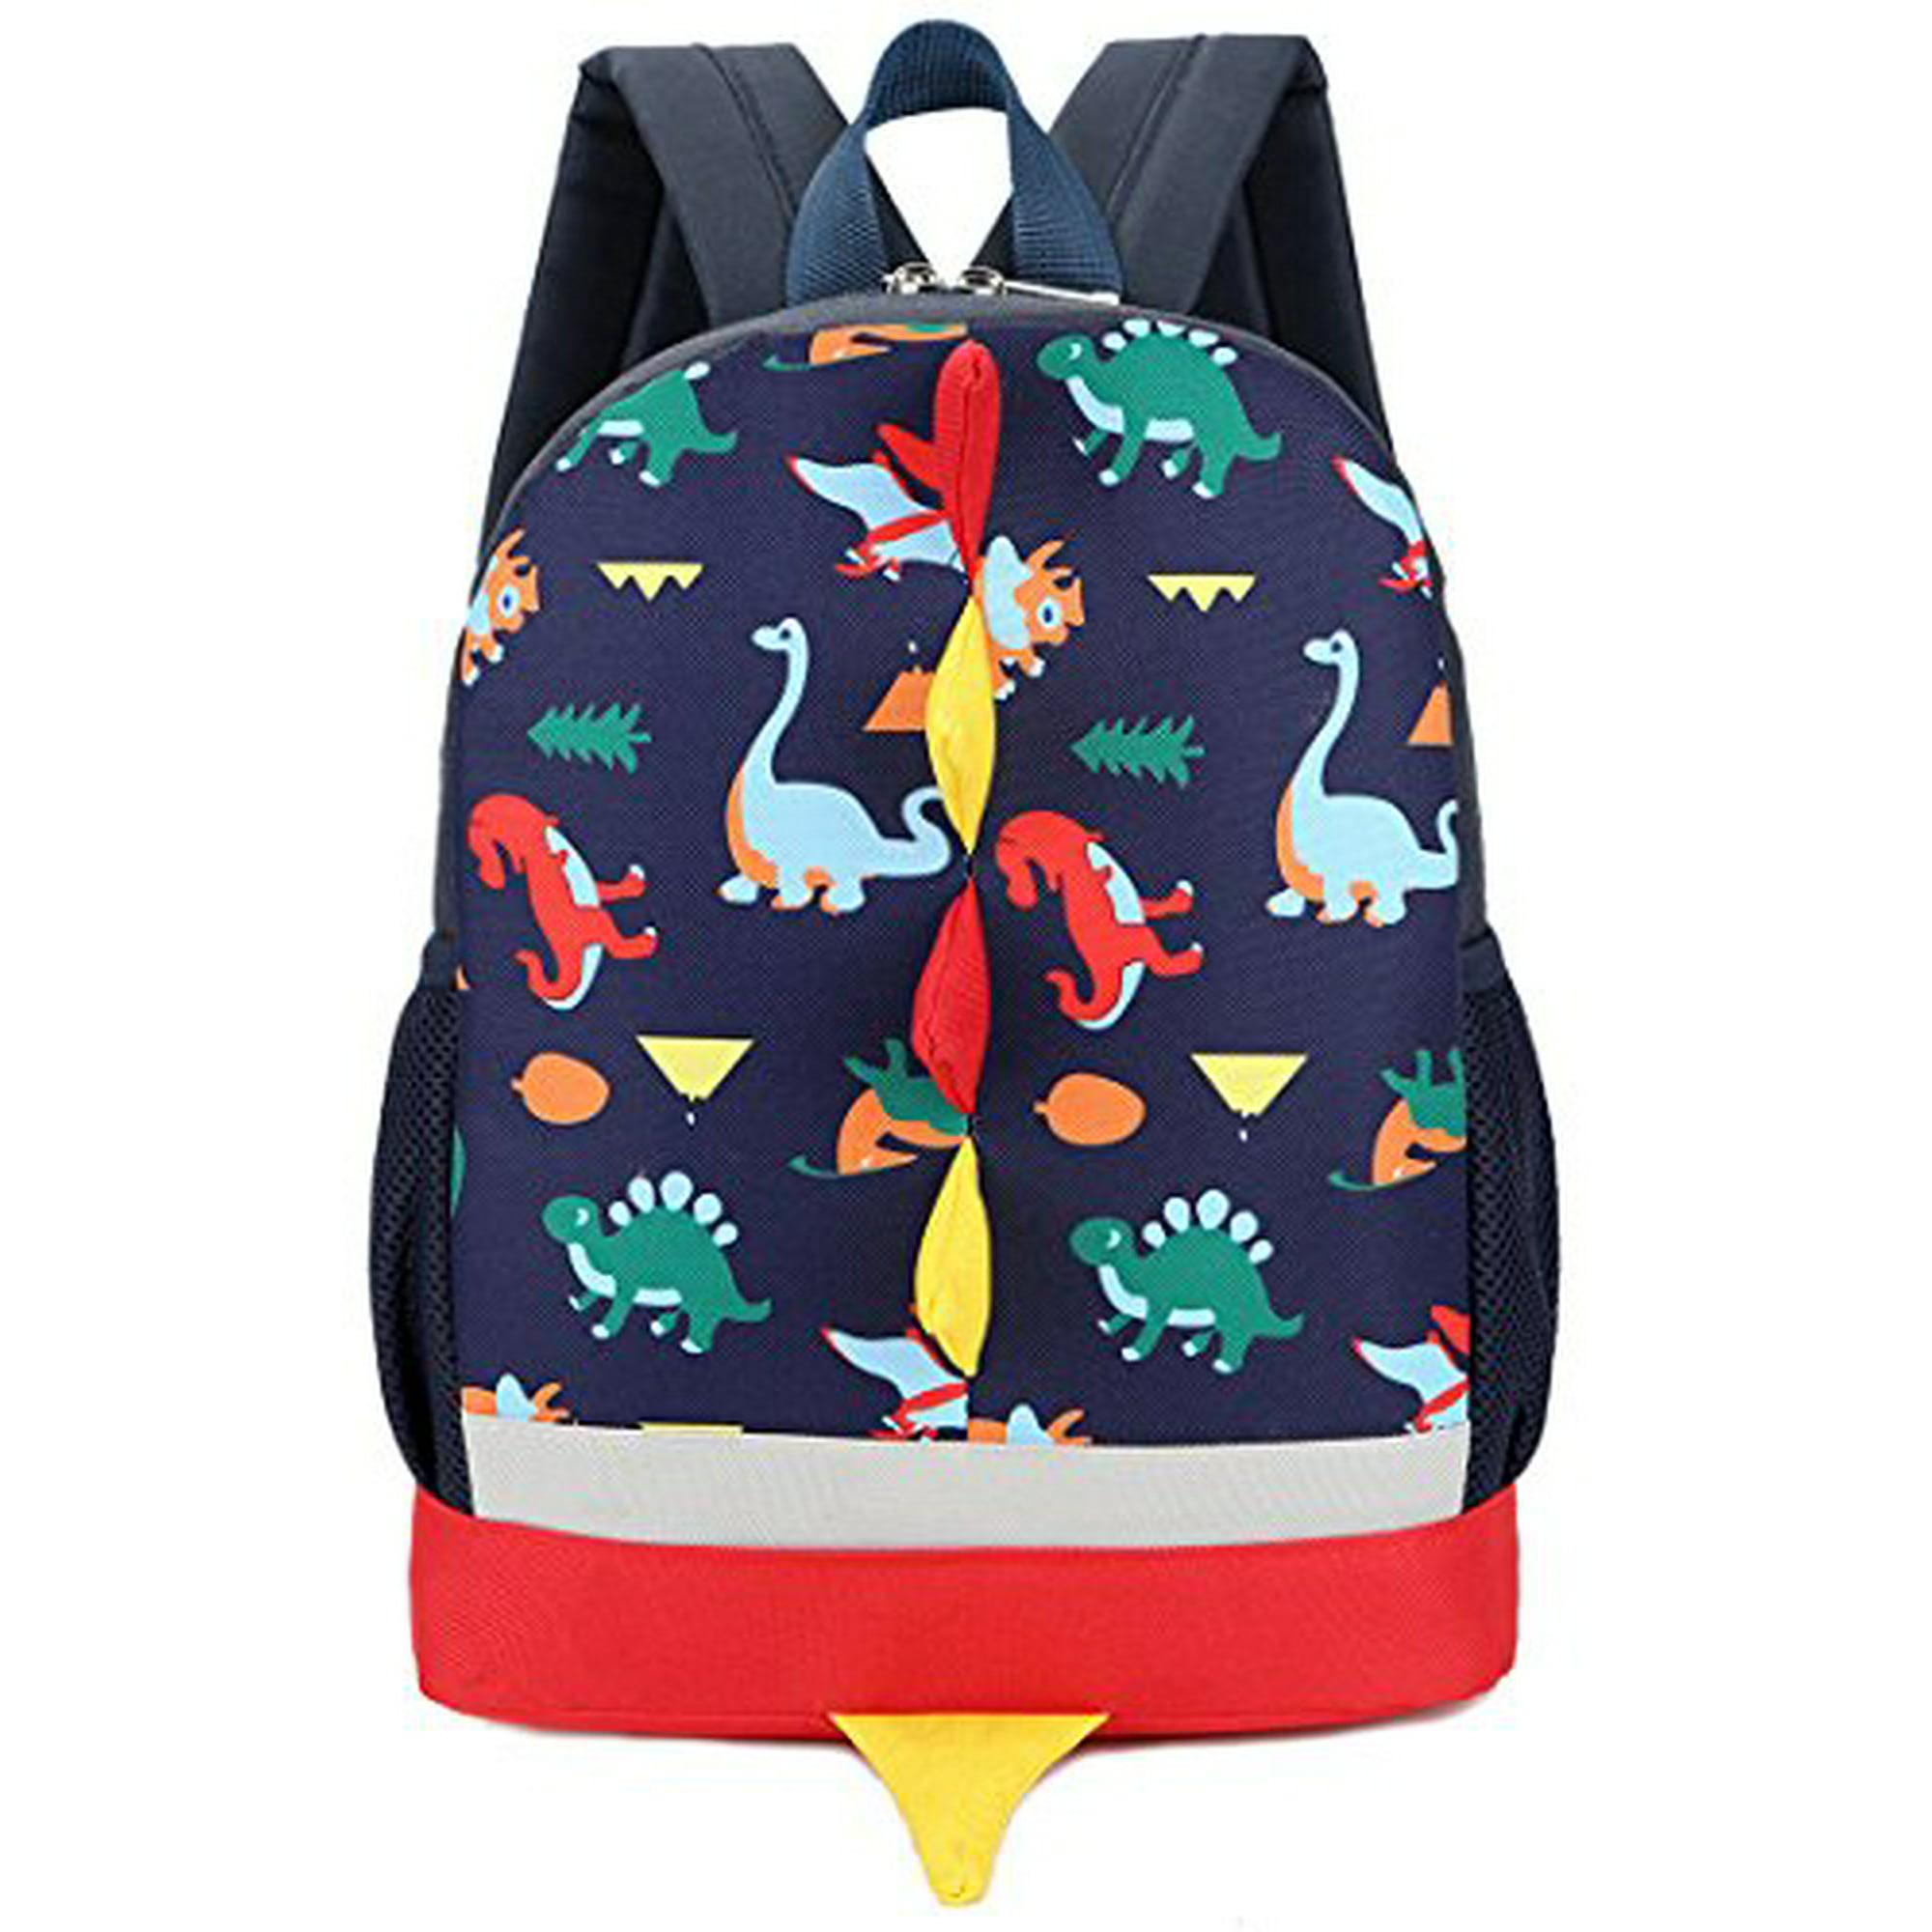 22b2fba1588e Kid Backpack Boy Preschool with Strap Dinosaur Blue Kindergarten ...